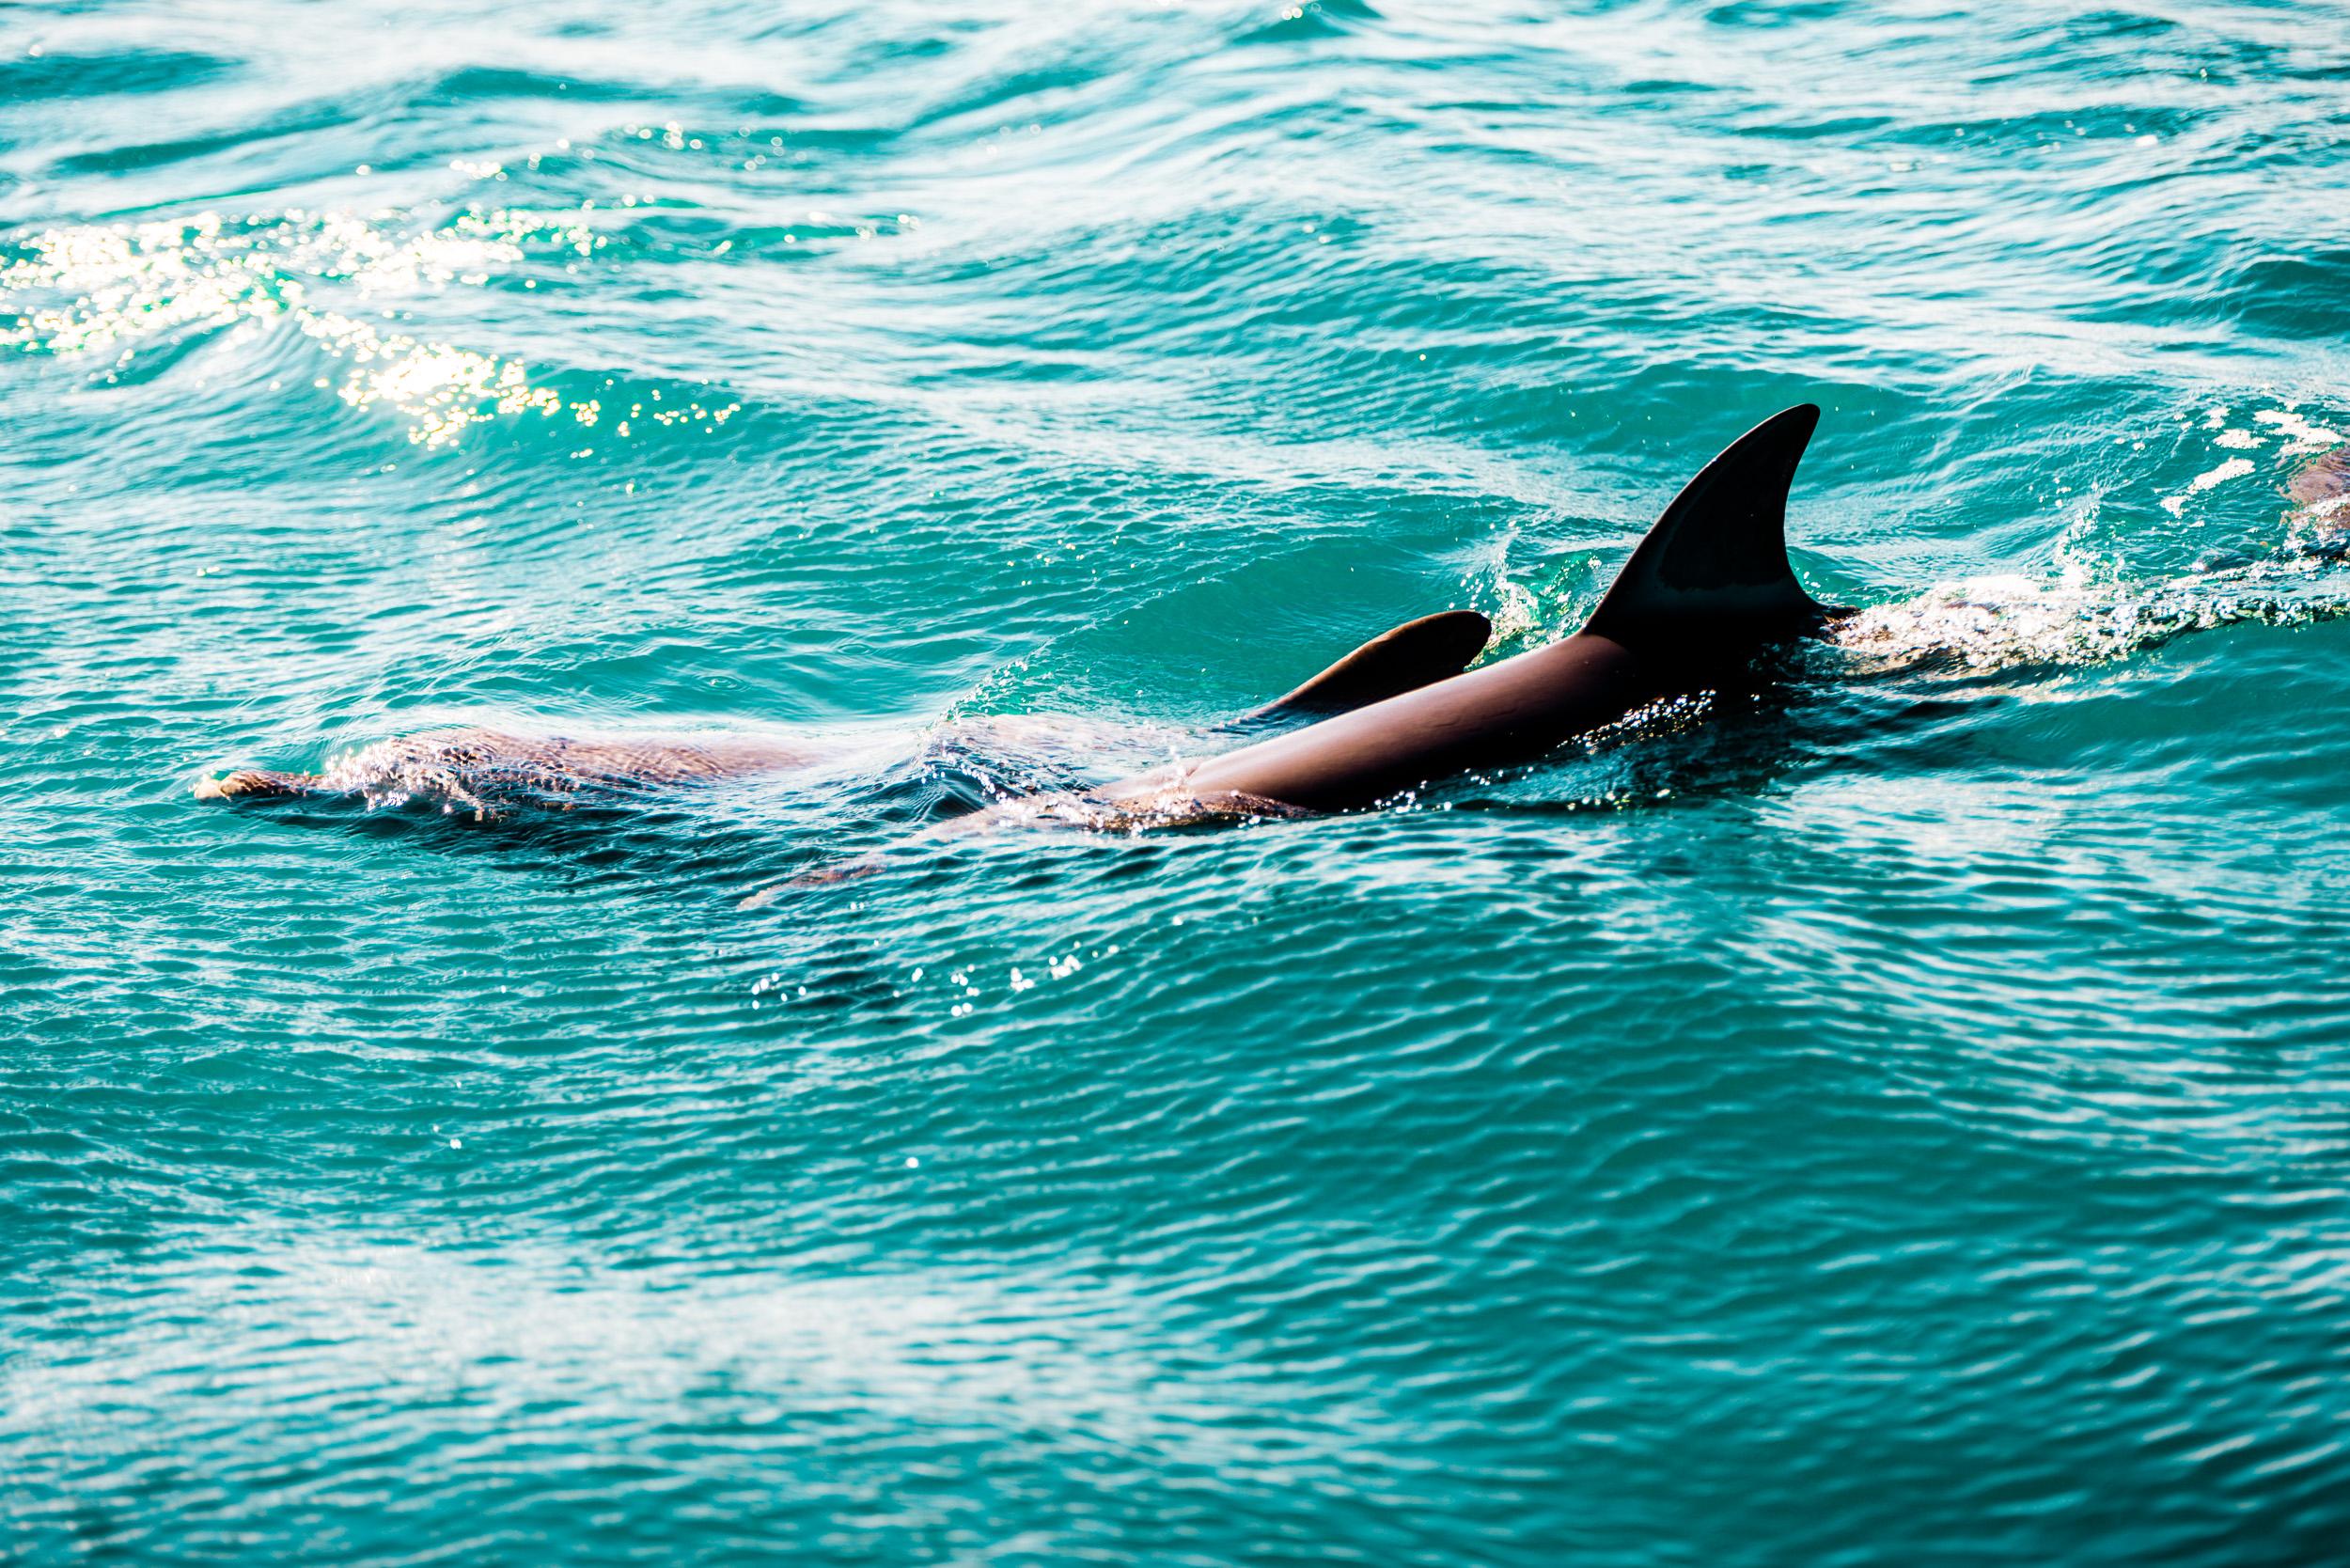 Spyrides_Kyle_Dolphin_Swimming_Rockingham_DSC2817.jpg